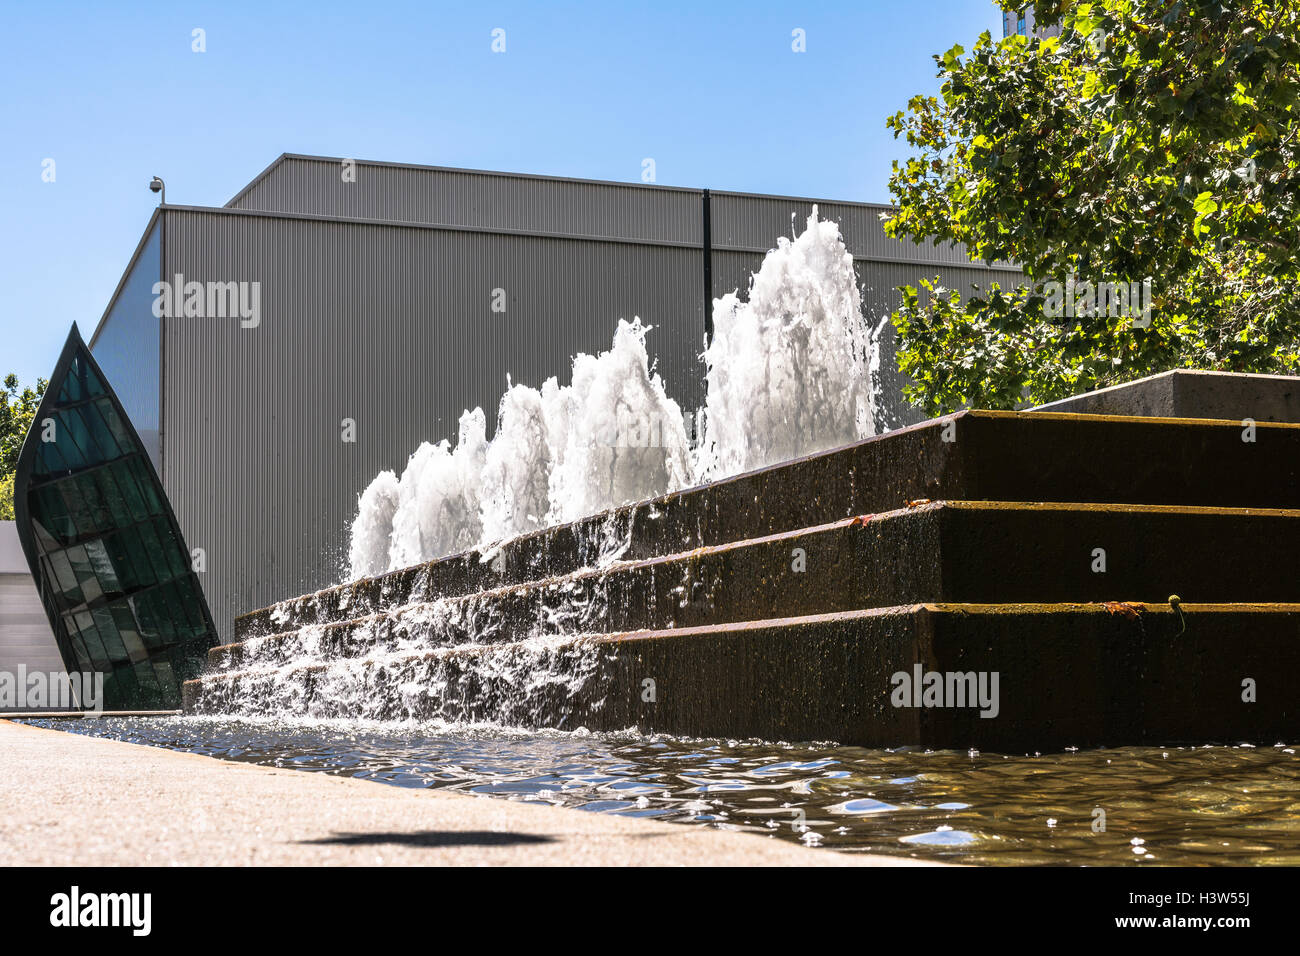 Fountain at Yerba Buena Gardens, San Francisco - Stock Image